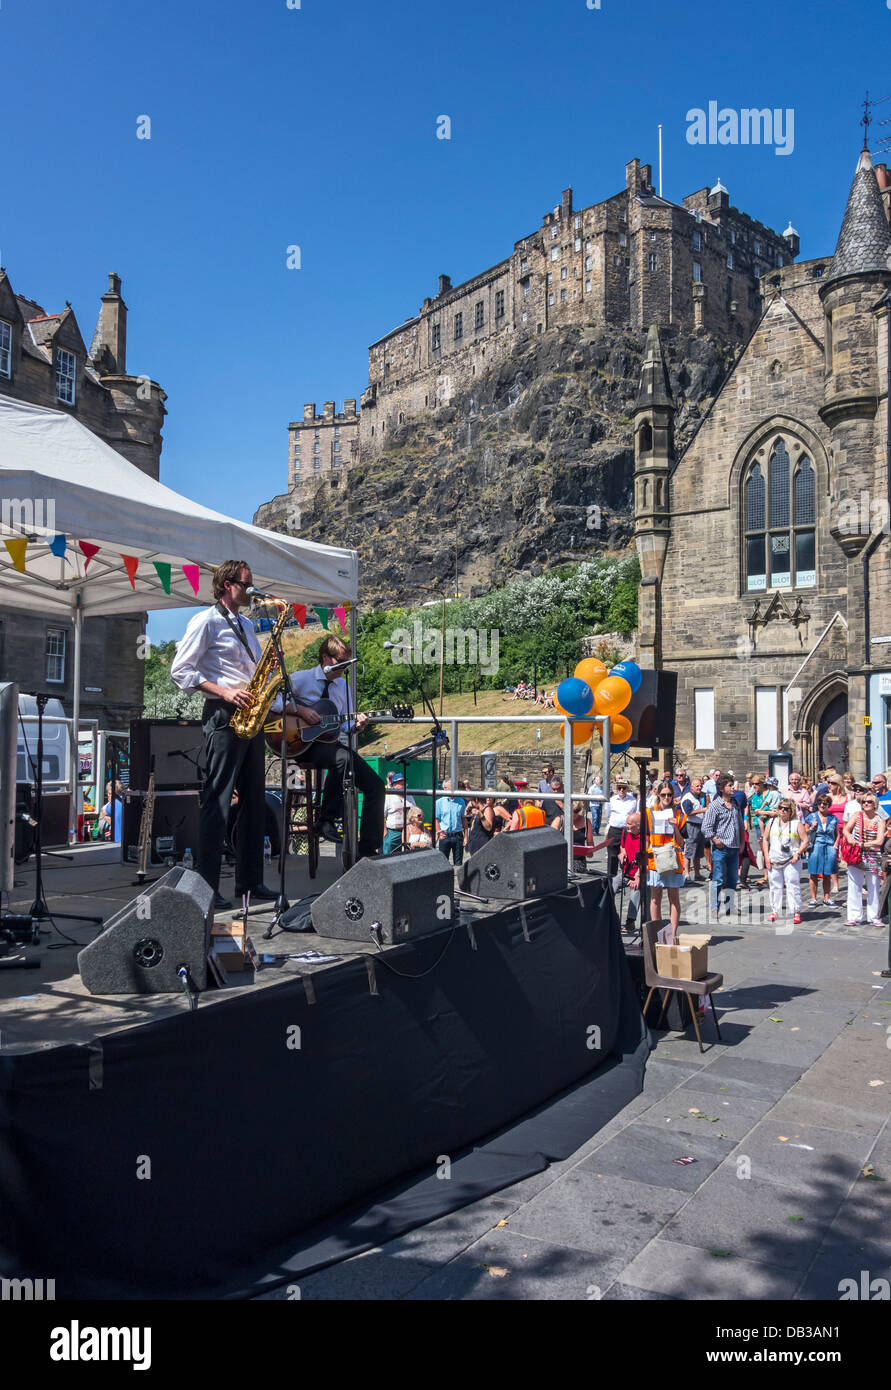 Il gruppo tedesco Shreveport Rhythm giocando al 2013 Edinburgh Jazz & Blues Festival di Grassmarket presso il Mardi Foto Stock